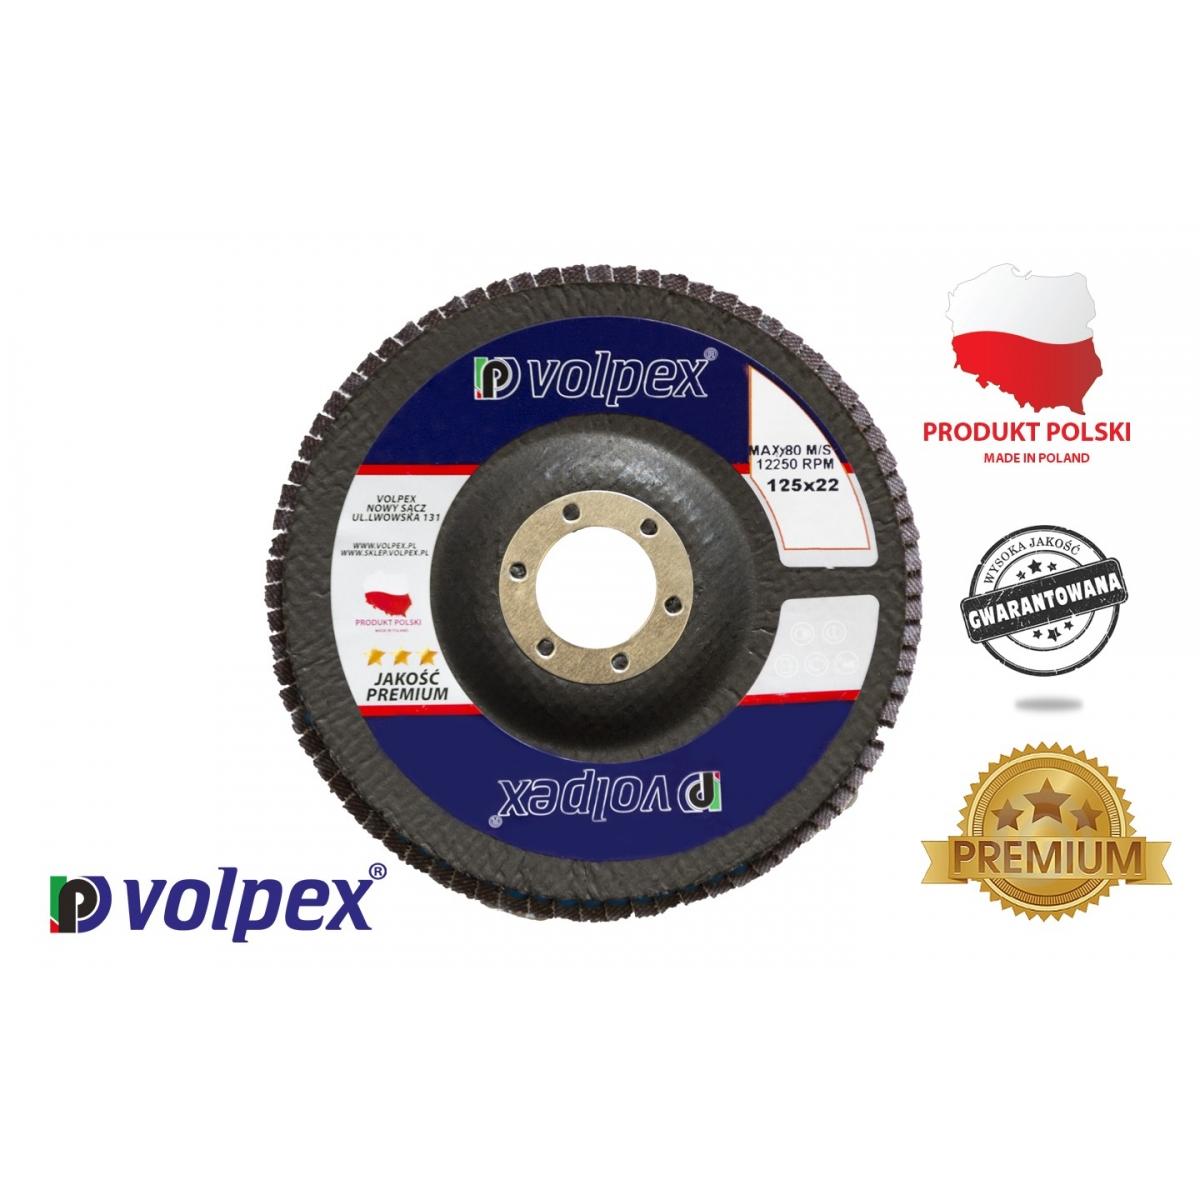 TARCZA PŁYTK. 125 GR.40 INOX PREMIUM VOLPEX Tarcza płytkowa 125 mm, inox premium - VOLPEX